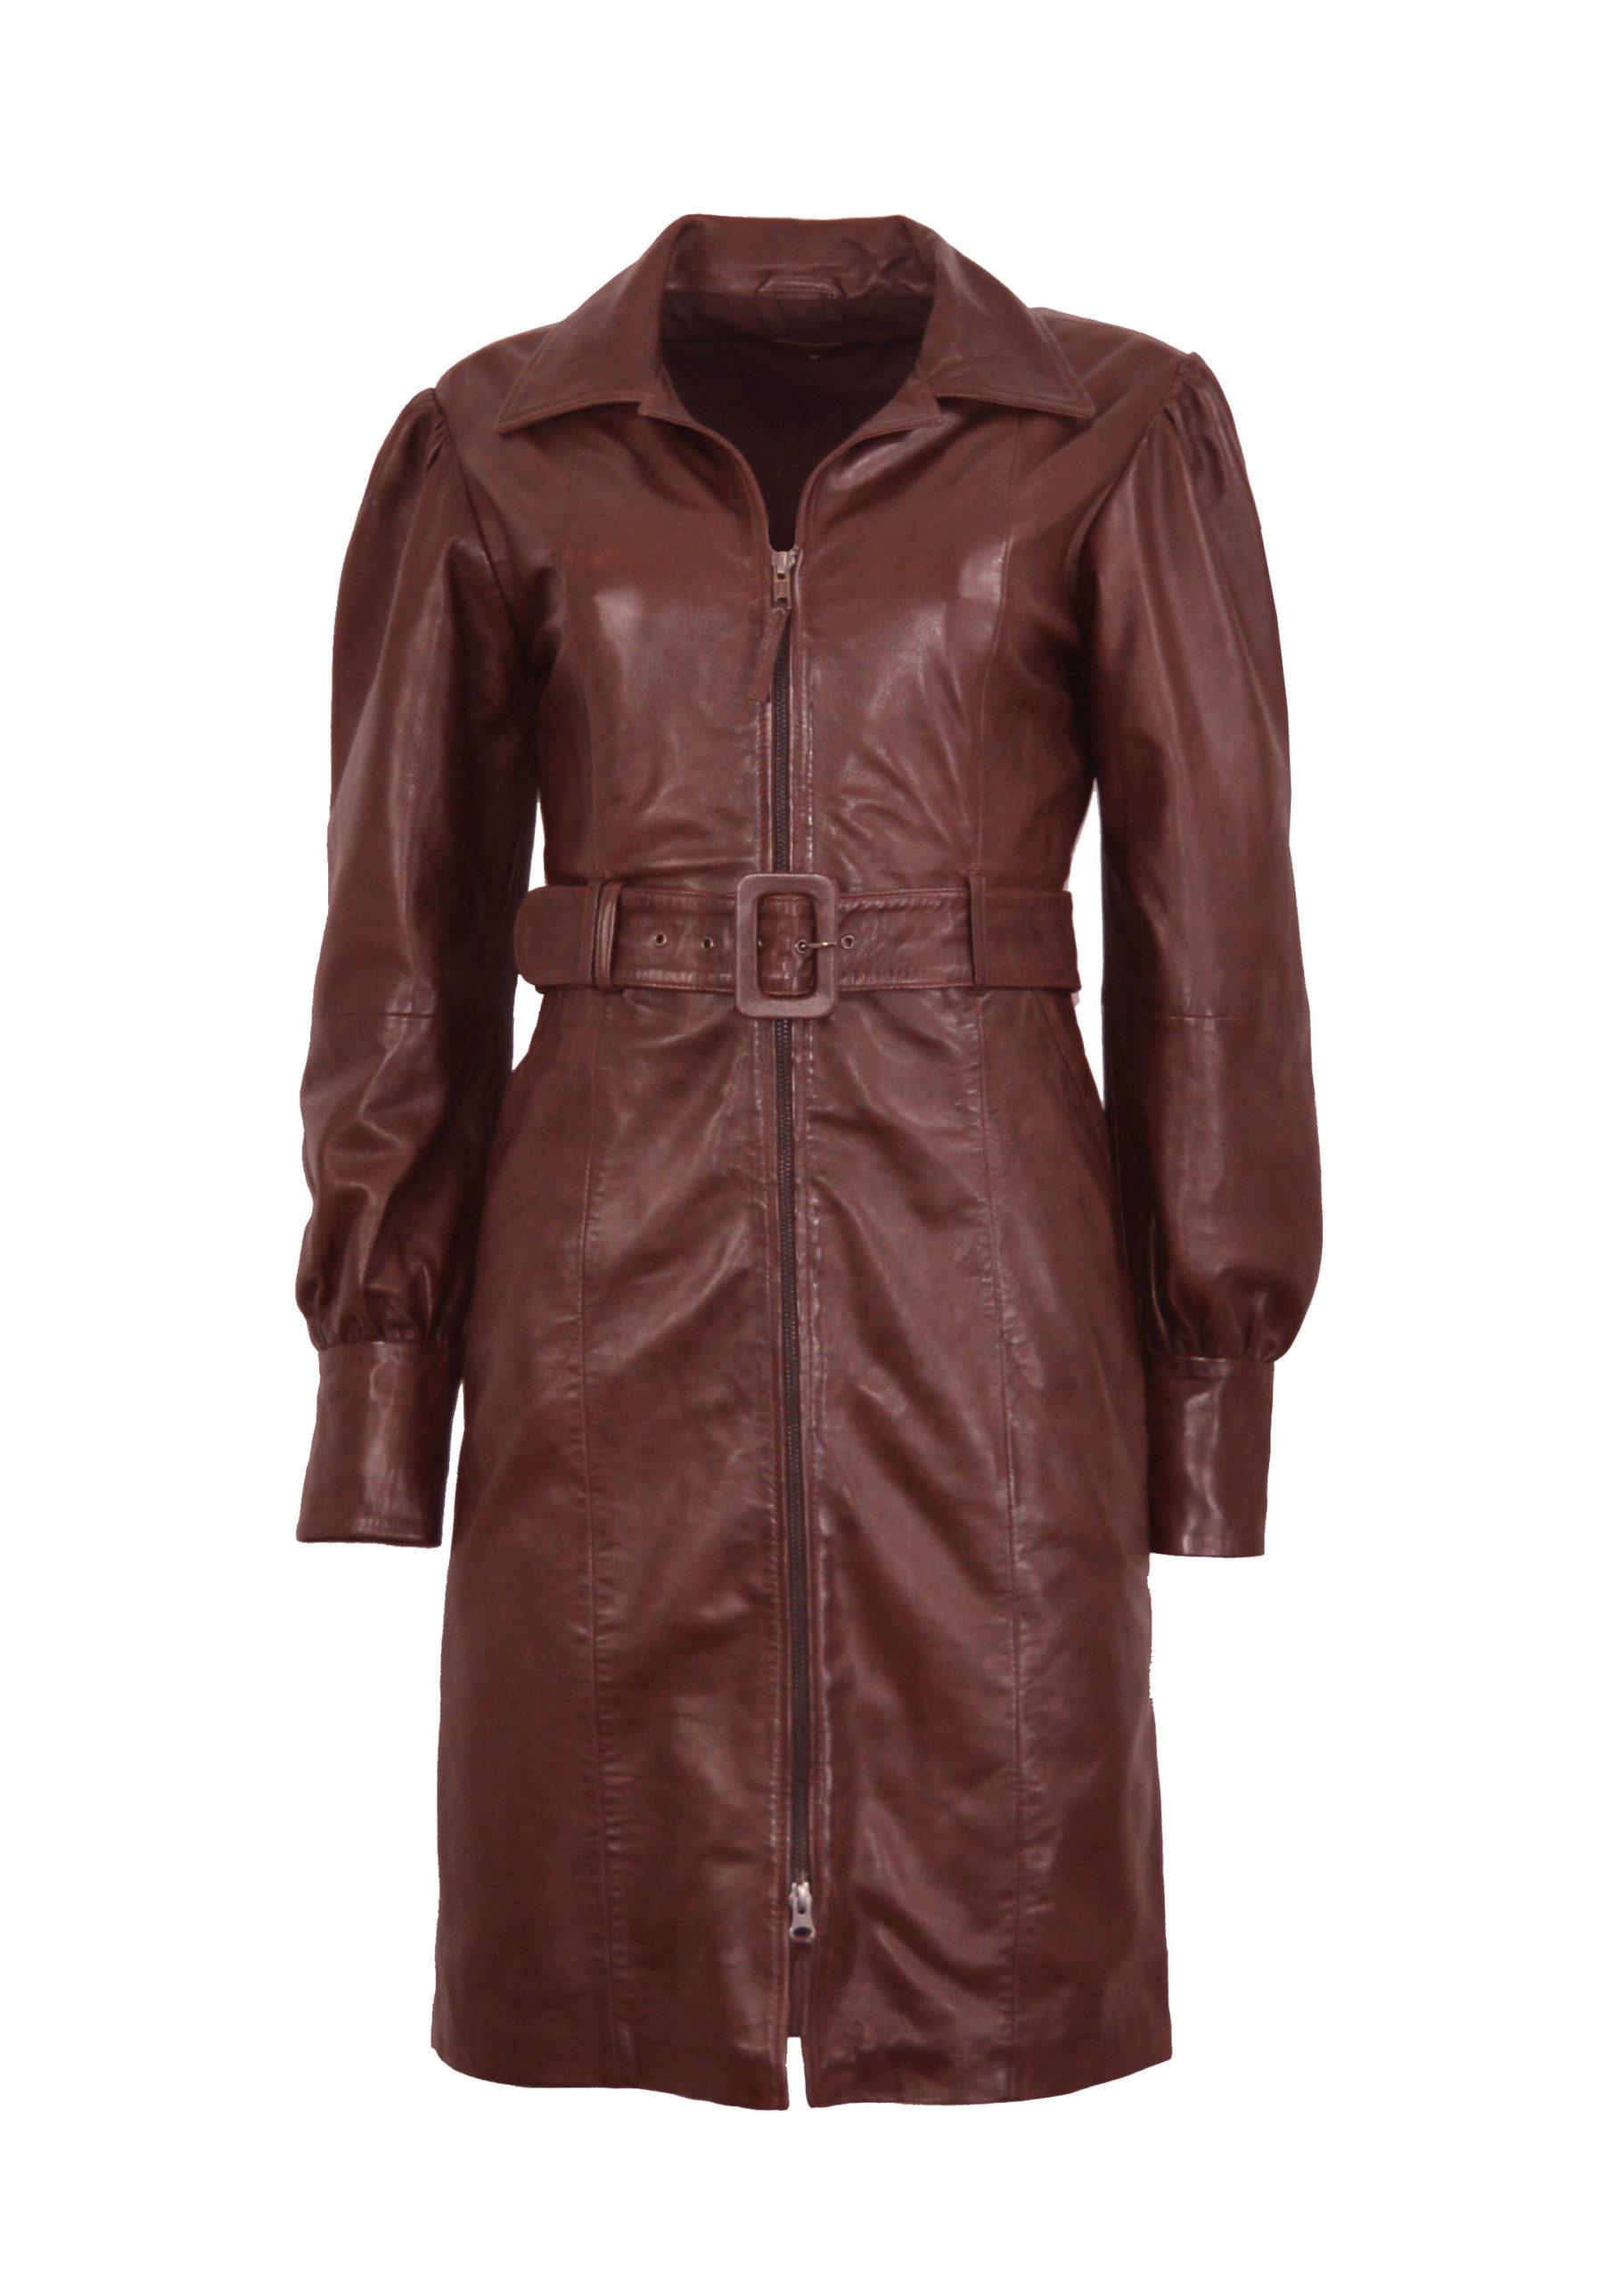 Zoef Leather Jurk Monica Aubergine 1